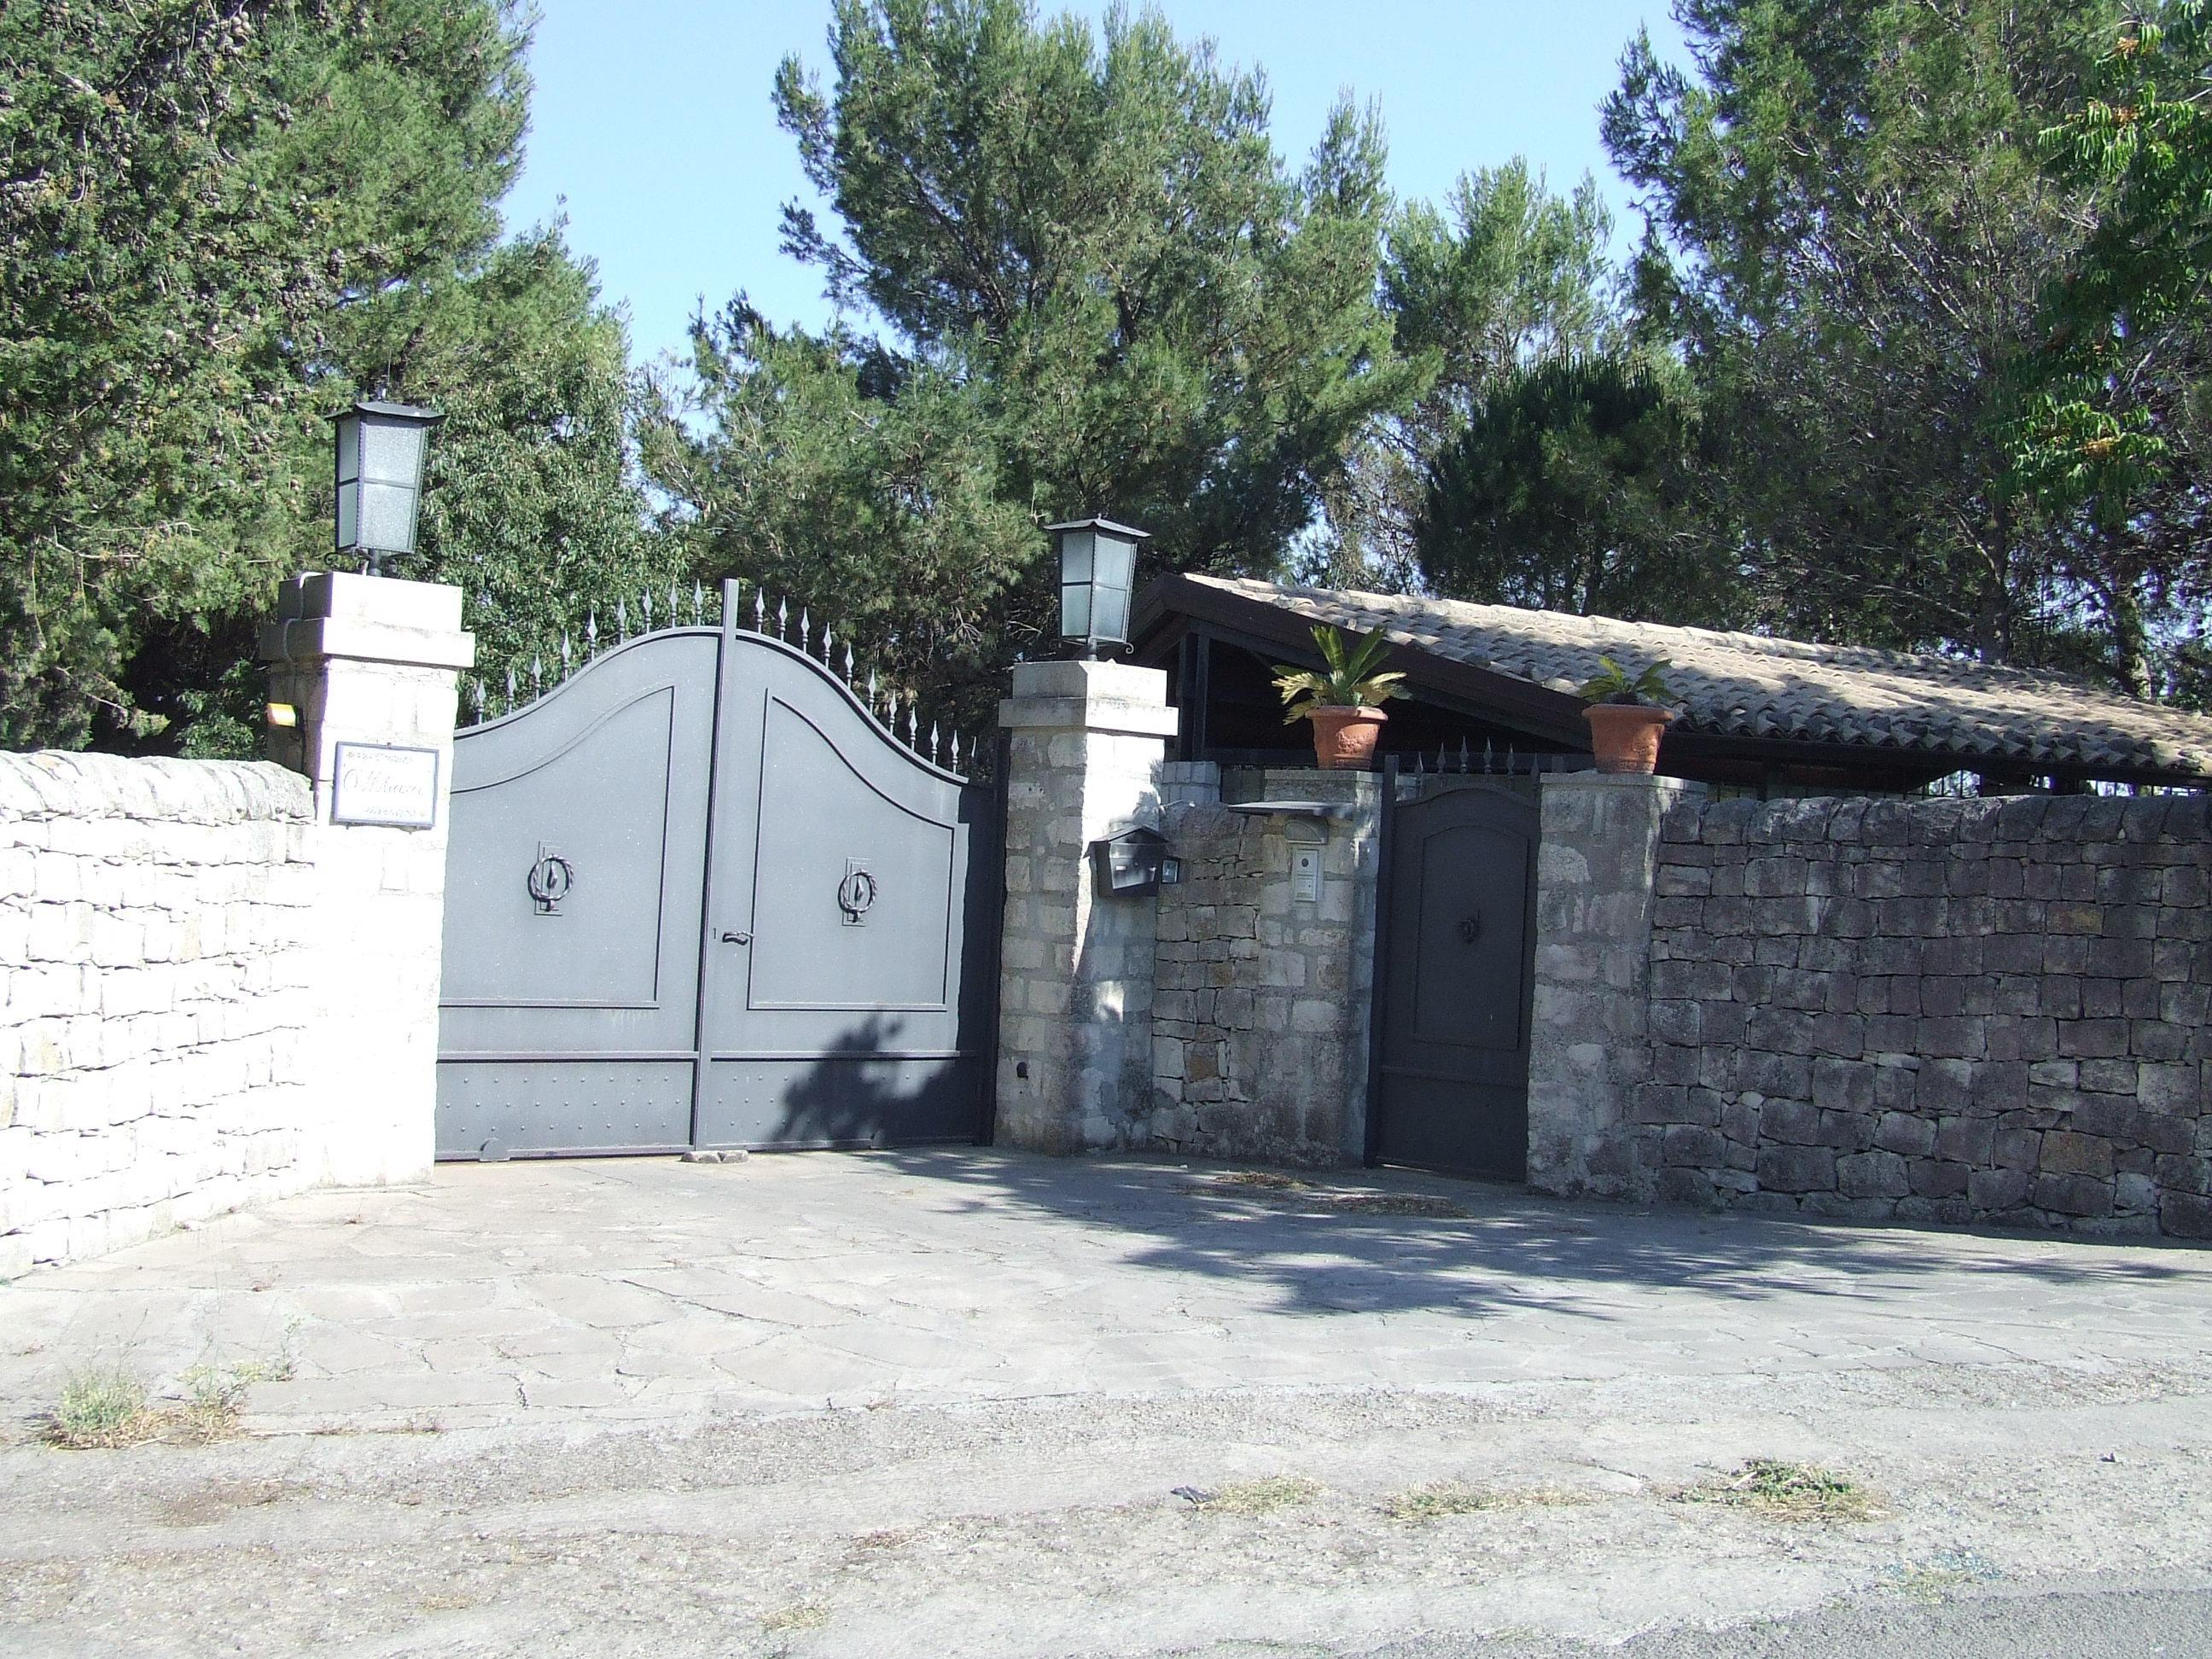 Appartement de vacances Carrubo (1730191), Modica, Ragusa, Sicile, Italie, image 1